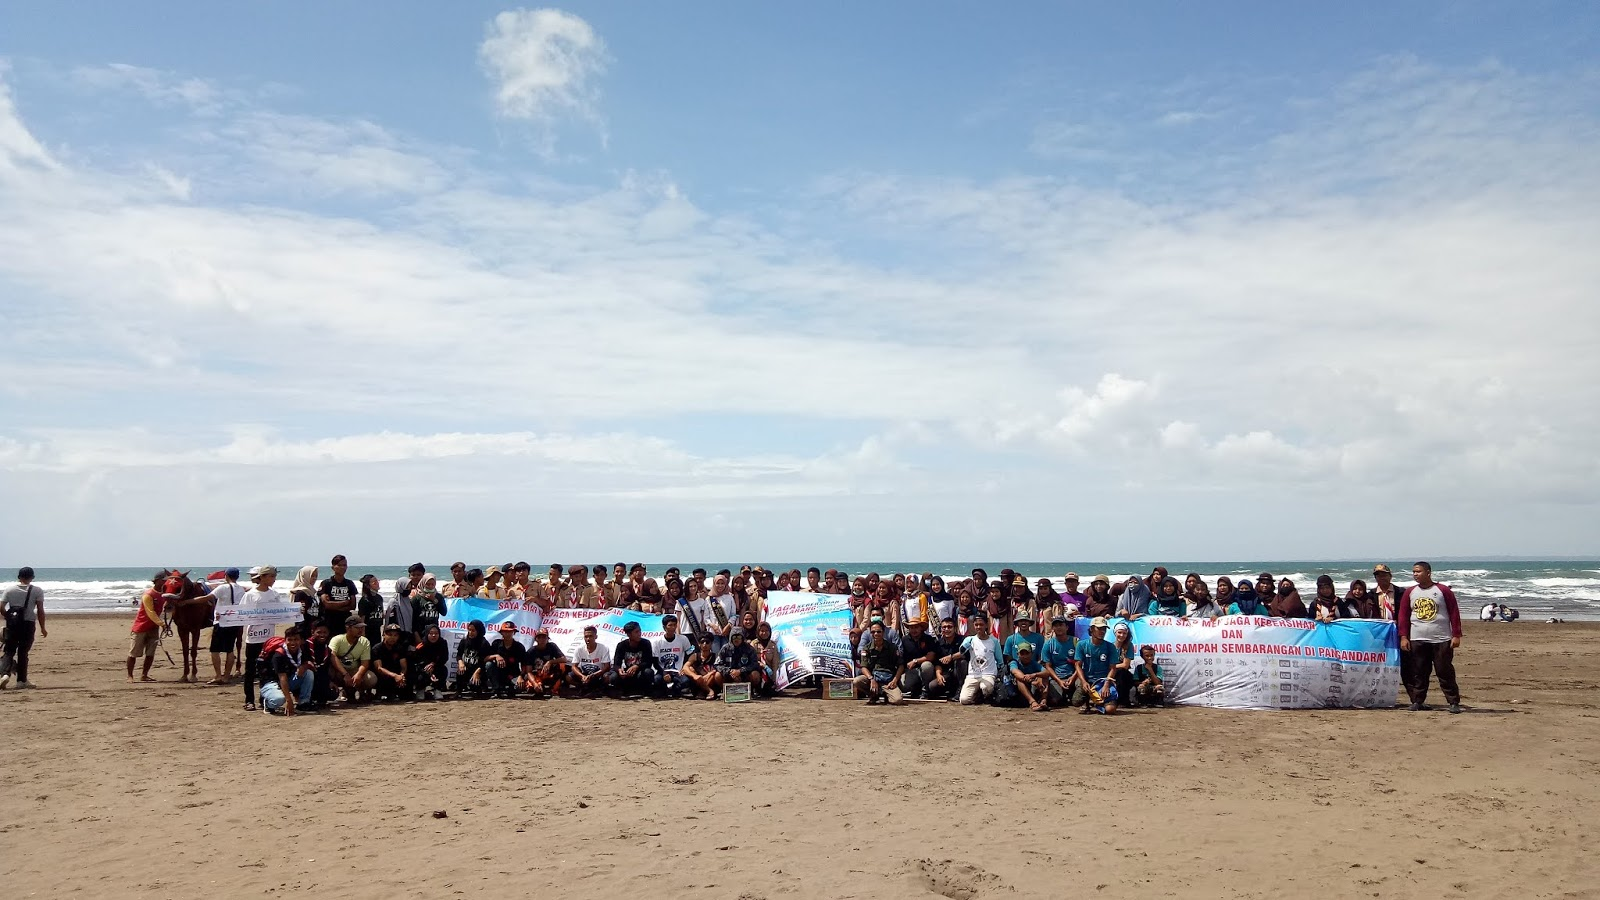 Awal Tahun 2019, Pemuda dan Ibu-Ibu Turun Ke Pantai Buat Petisi